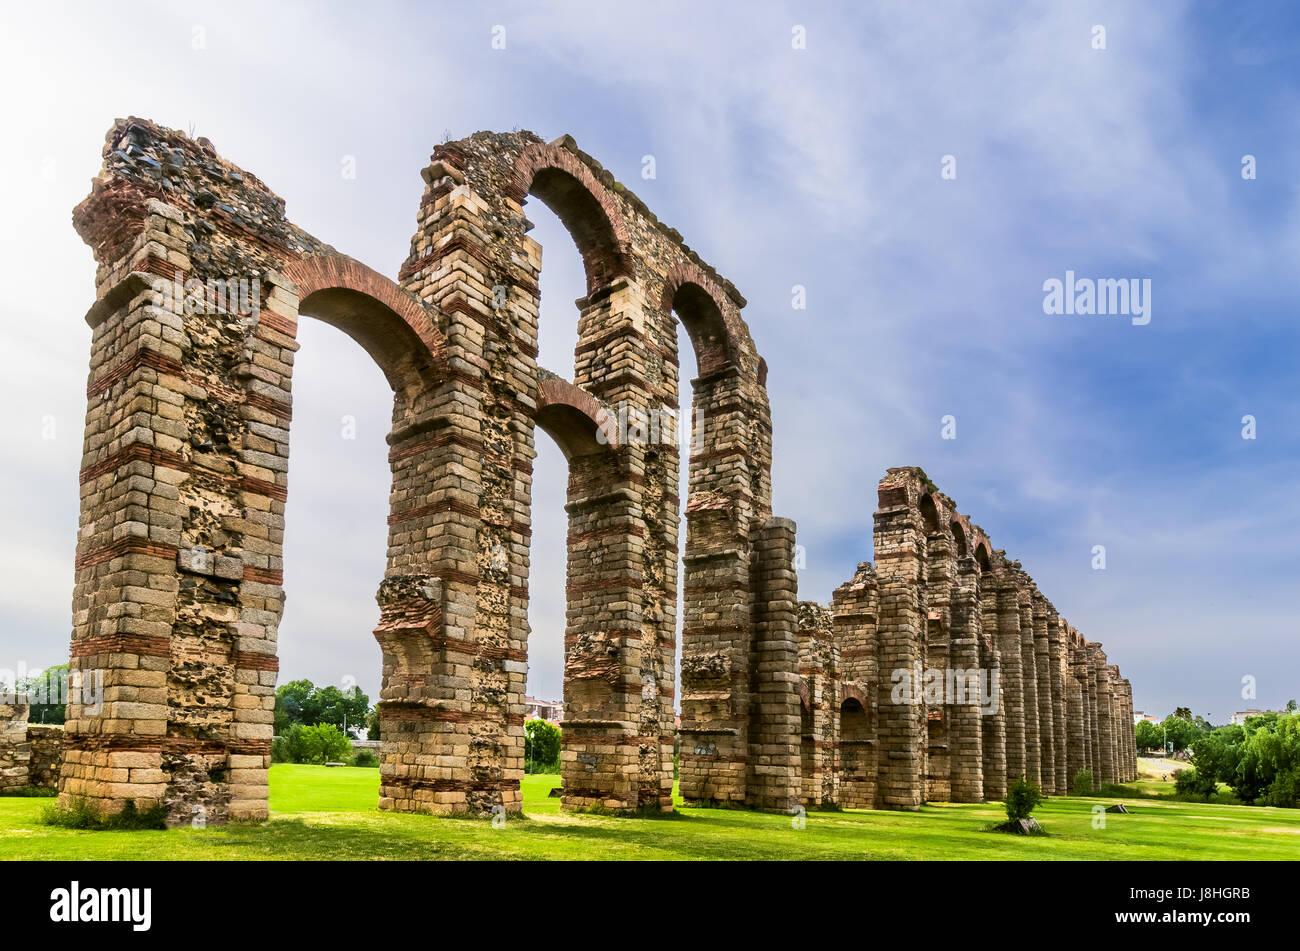 Acueducto de los Milagros or Miraculous Aqueduct in Mérida, Extremadura, Spain - Stock Image